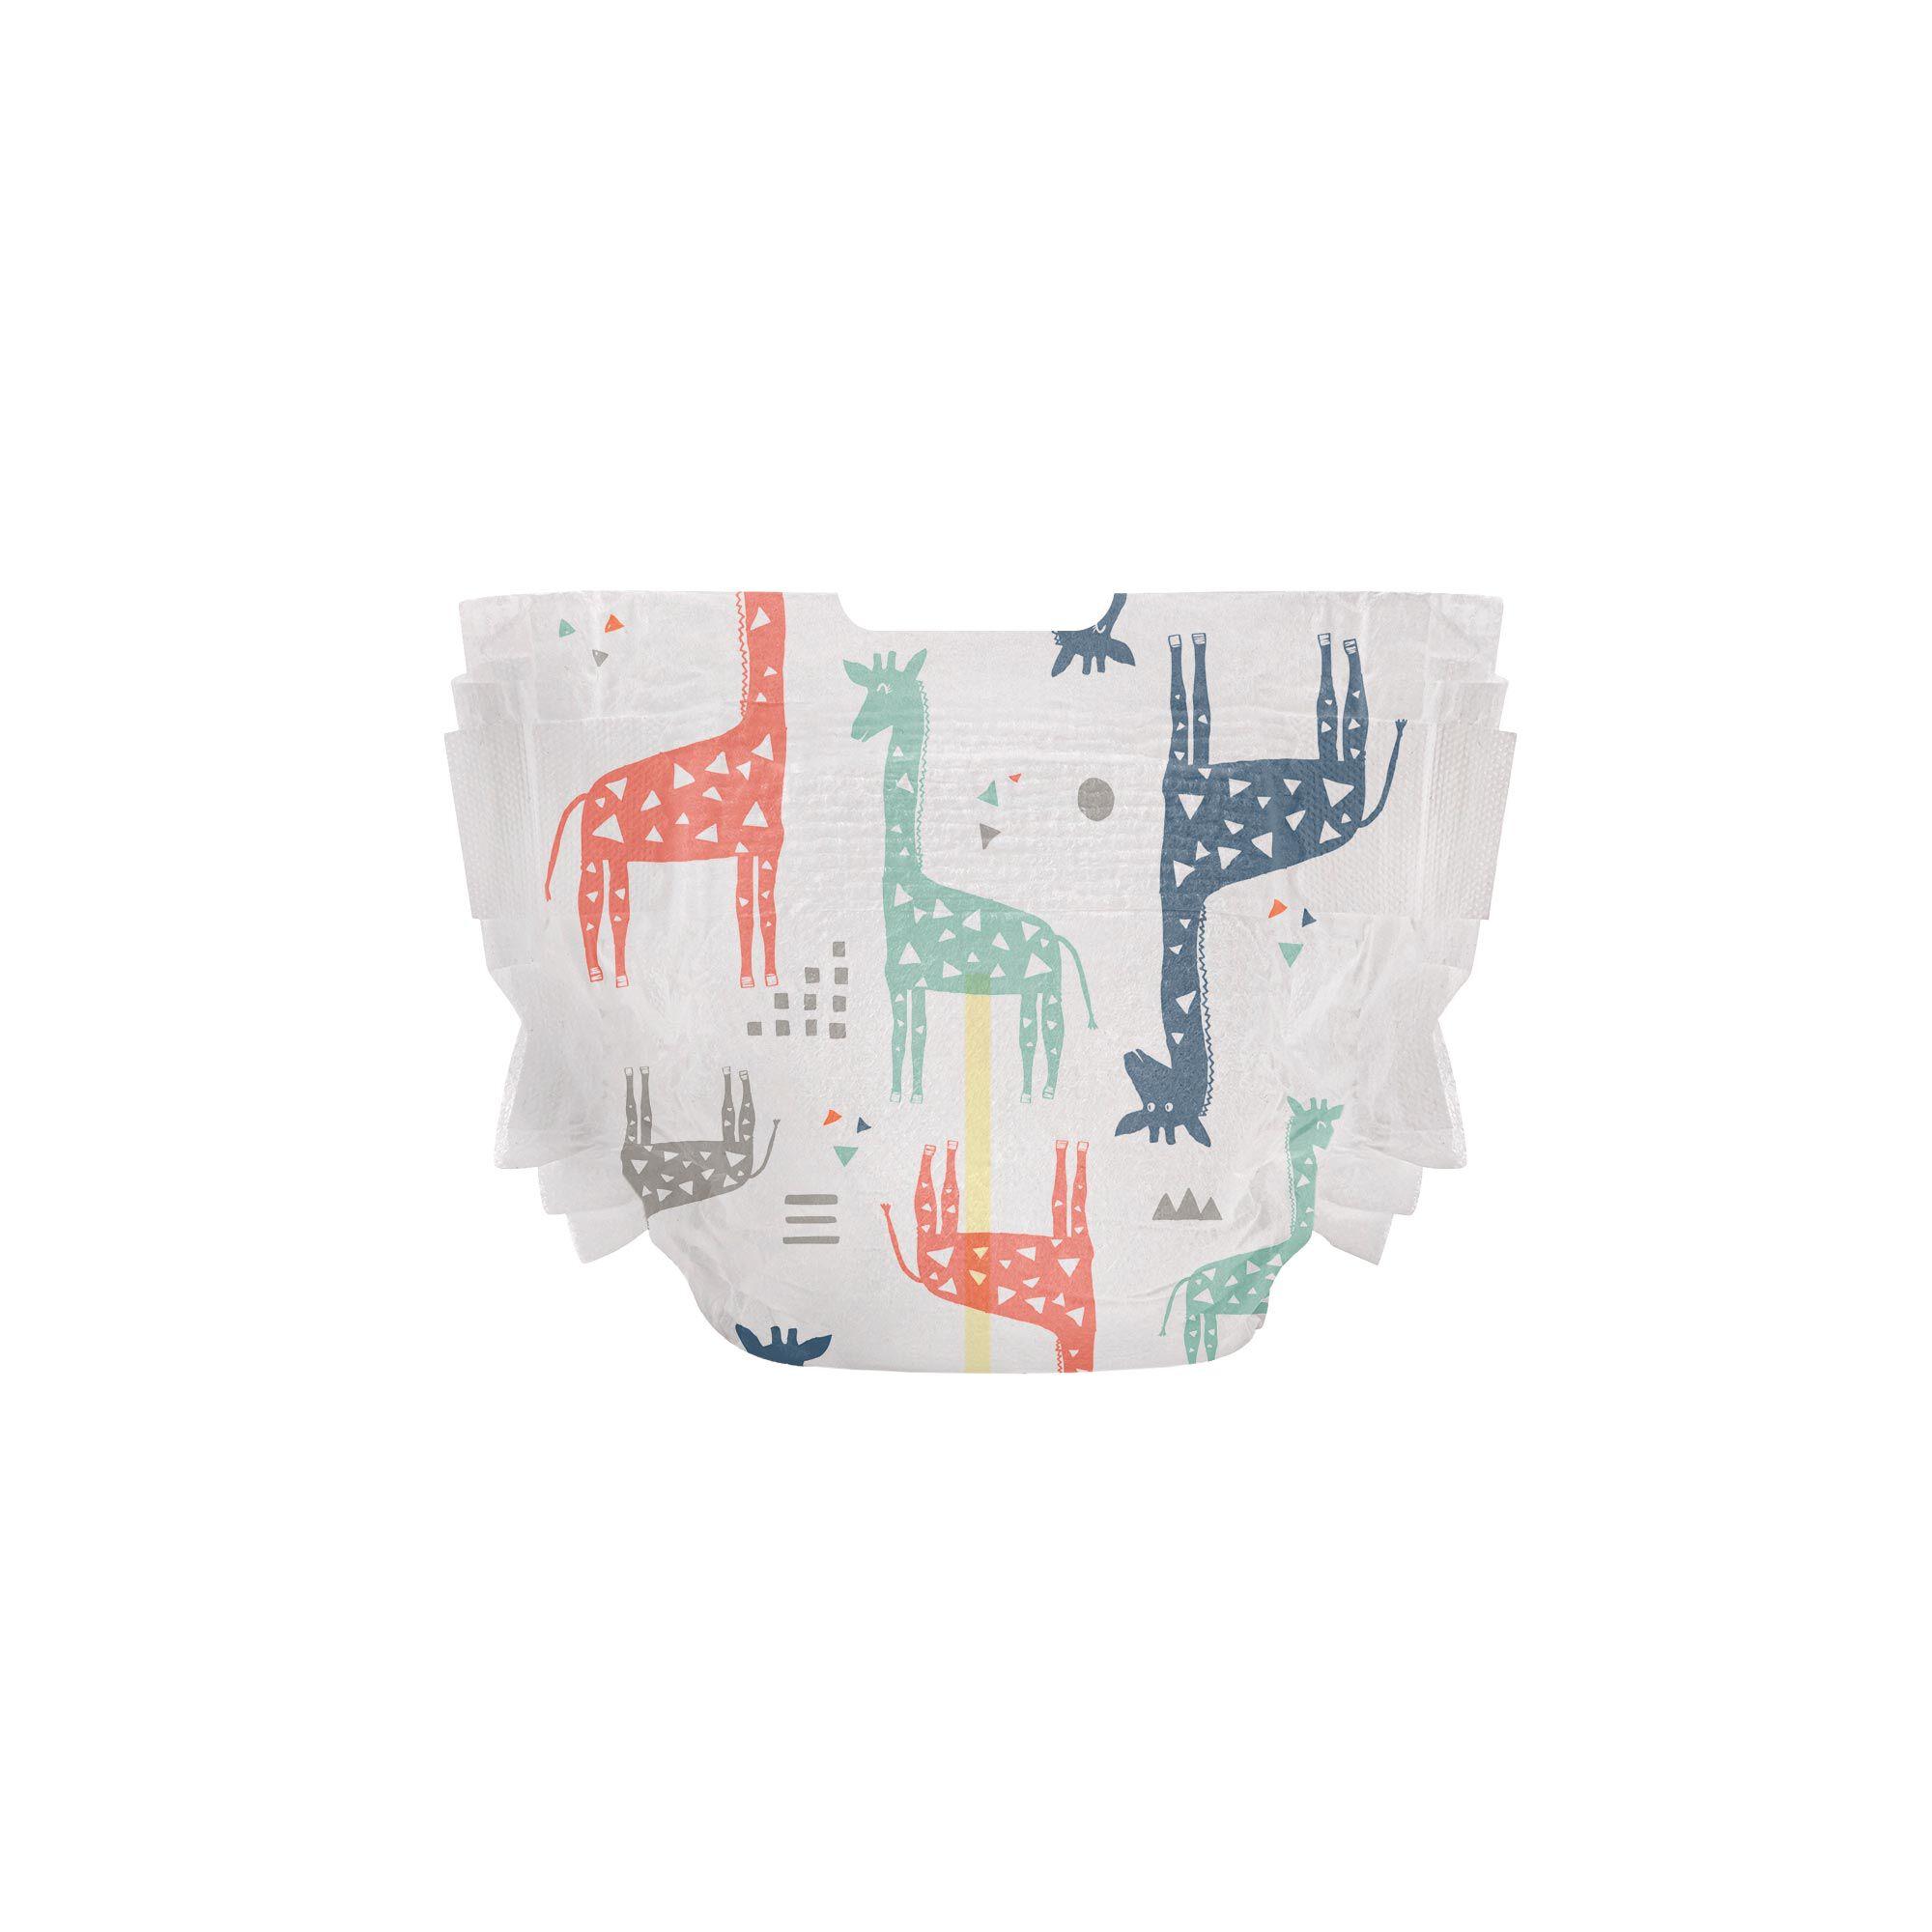 Clean Conscious Diaper, Multi-Colored Giraffes, Size NB